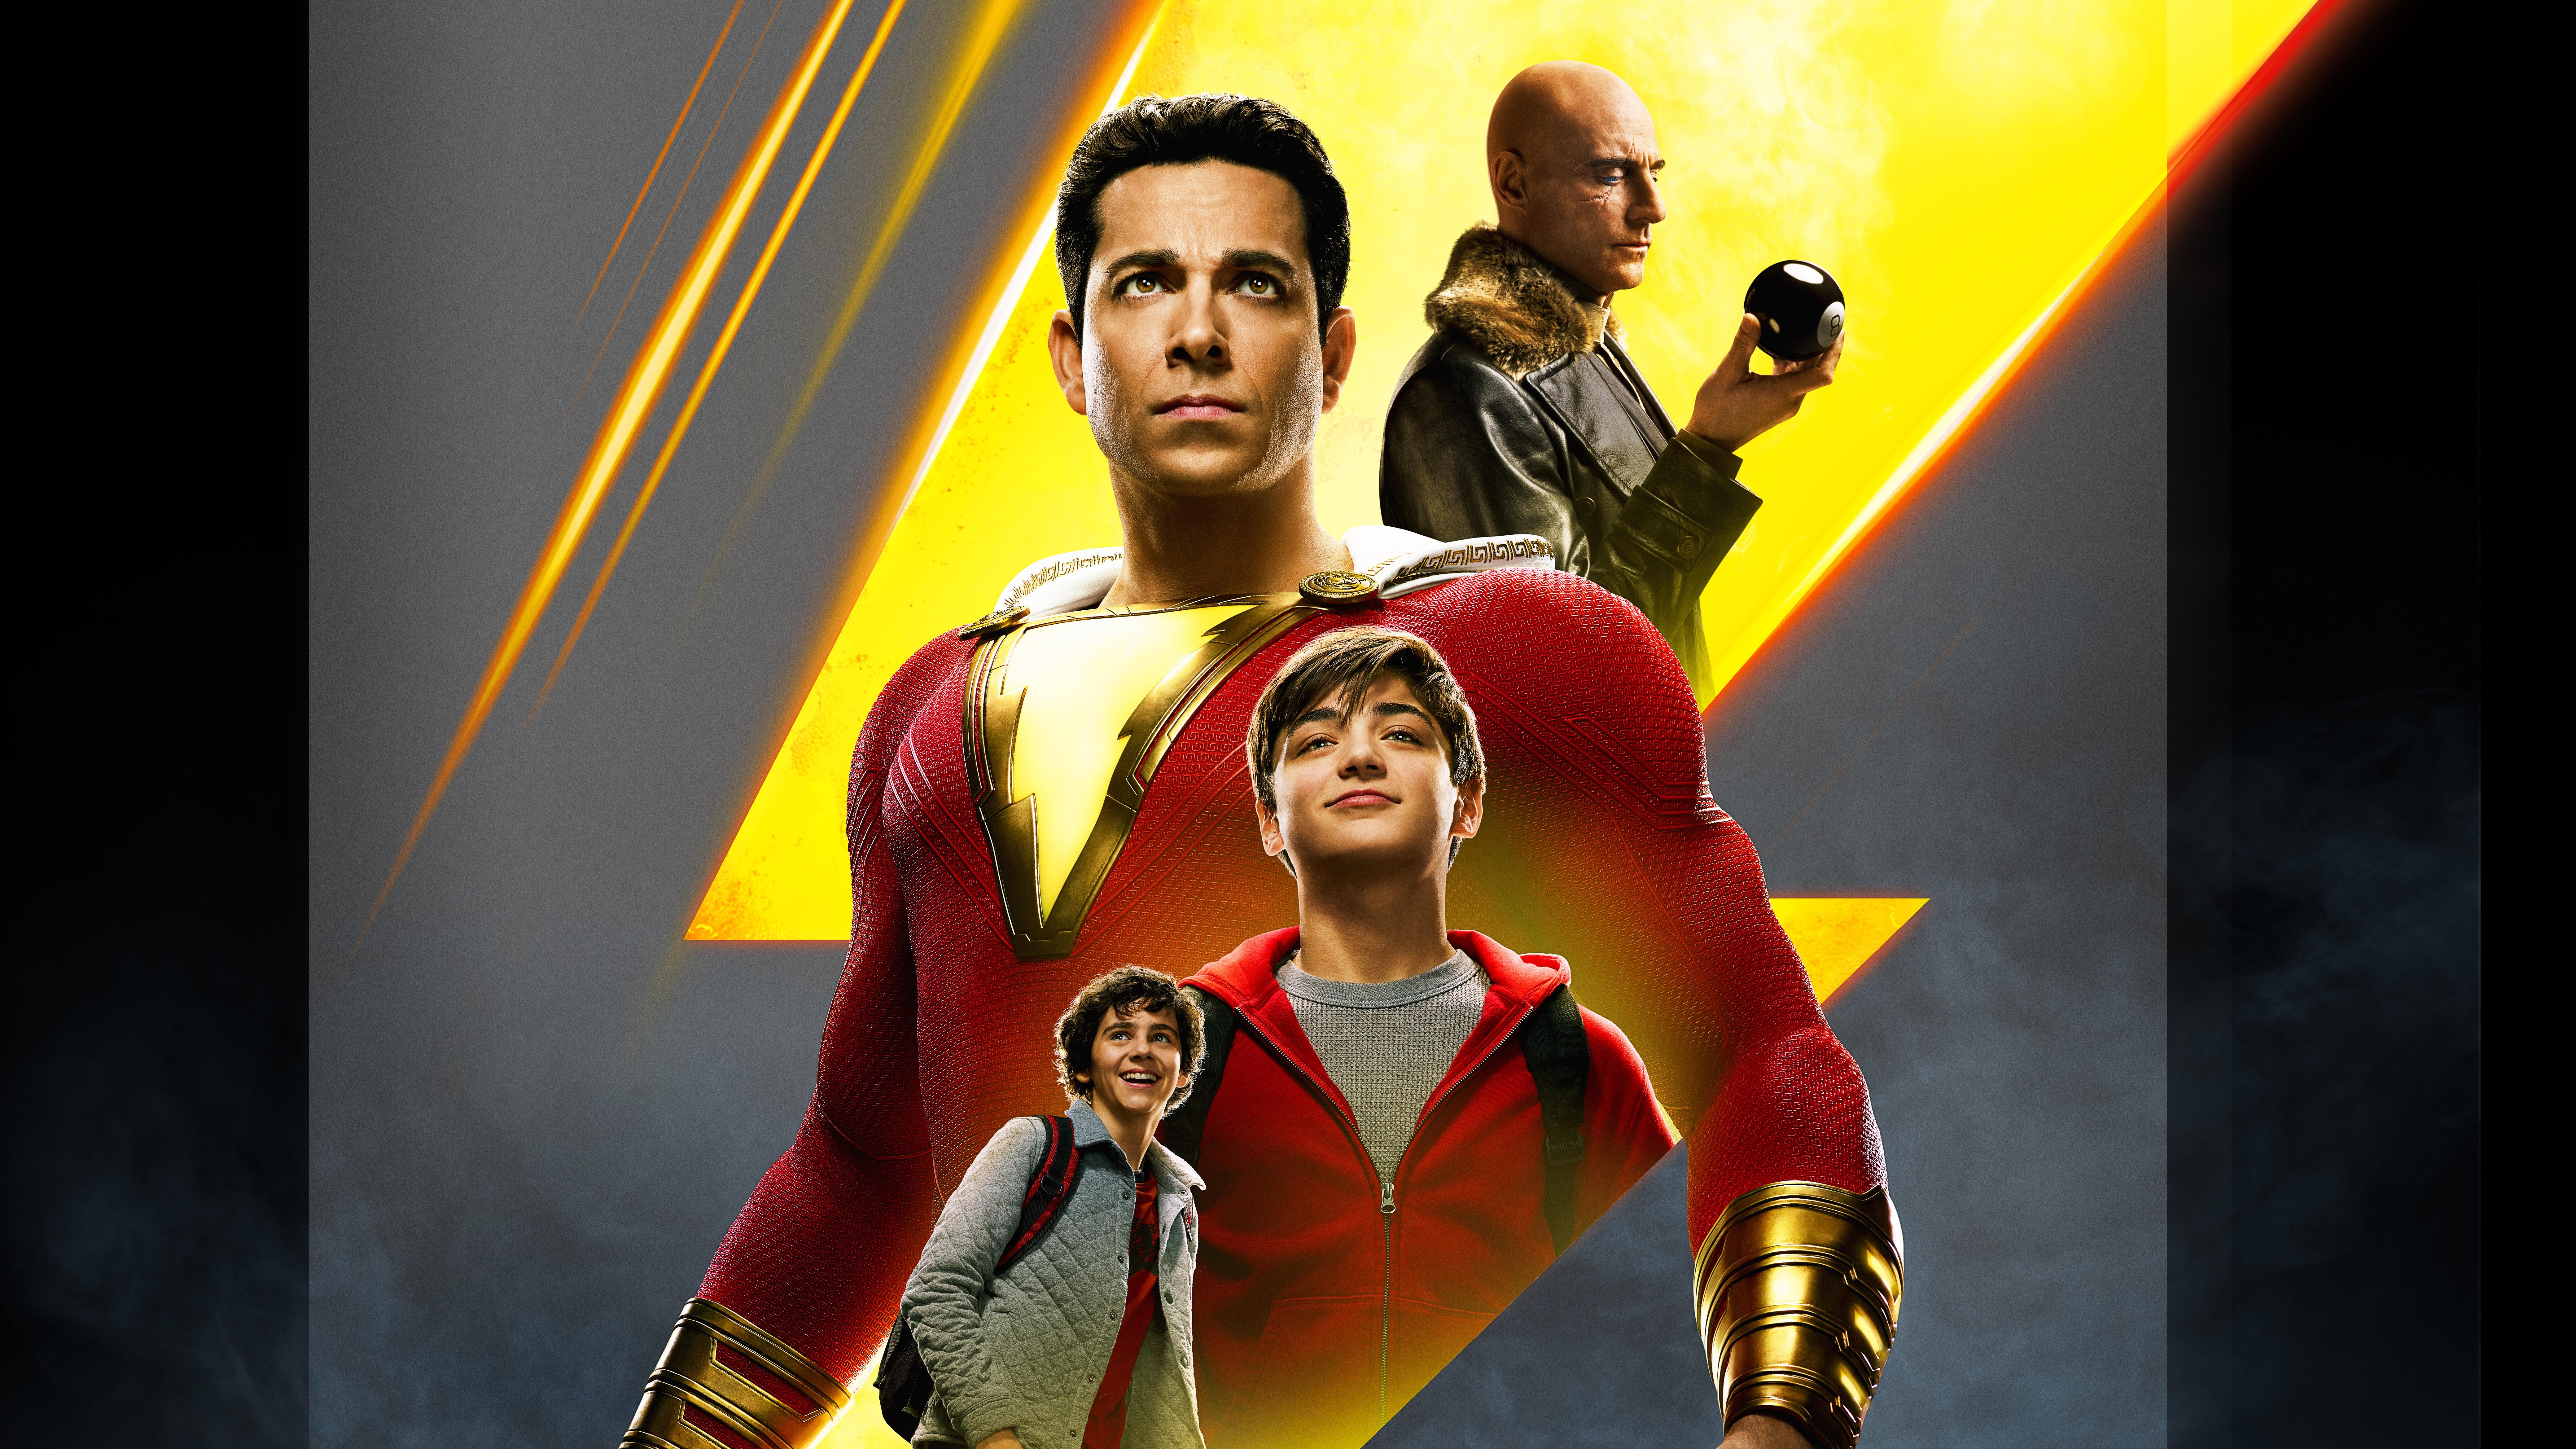 Movie Poster 2019: 1400x900 Shazam 2019 Movie China Poster 1400x900